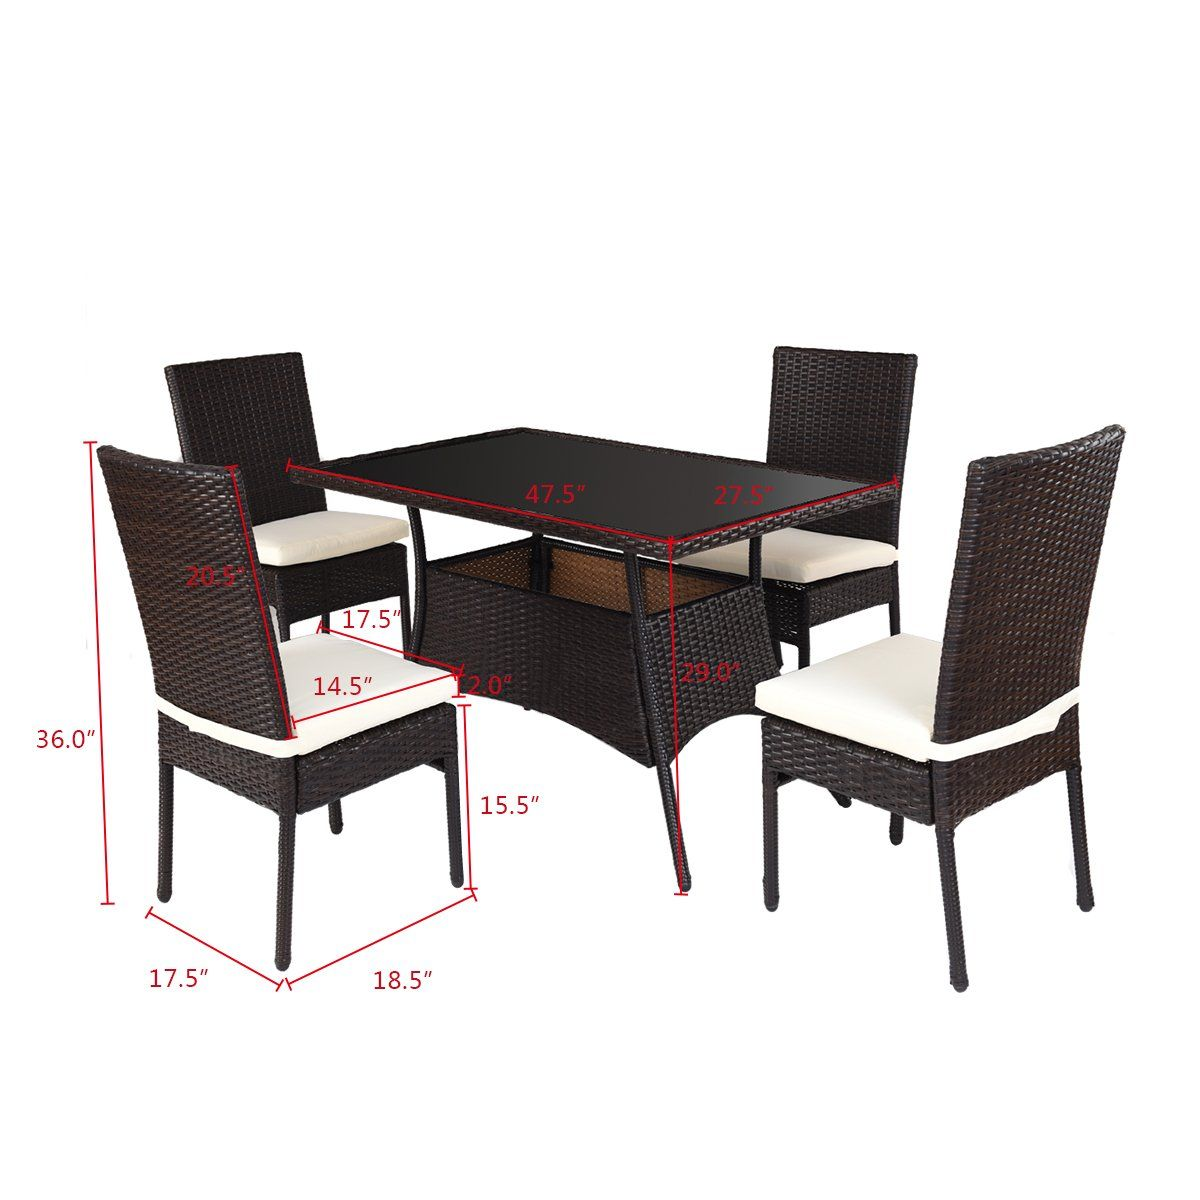 Tangkula Patio Furniture 5 Pcs Outdoor Balcony Wicker Rattan